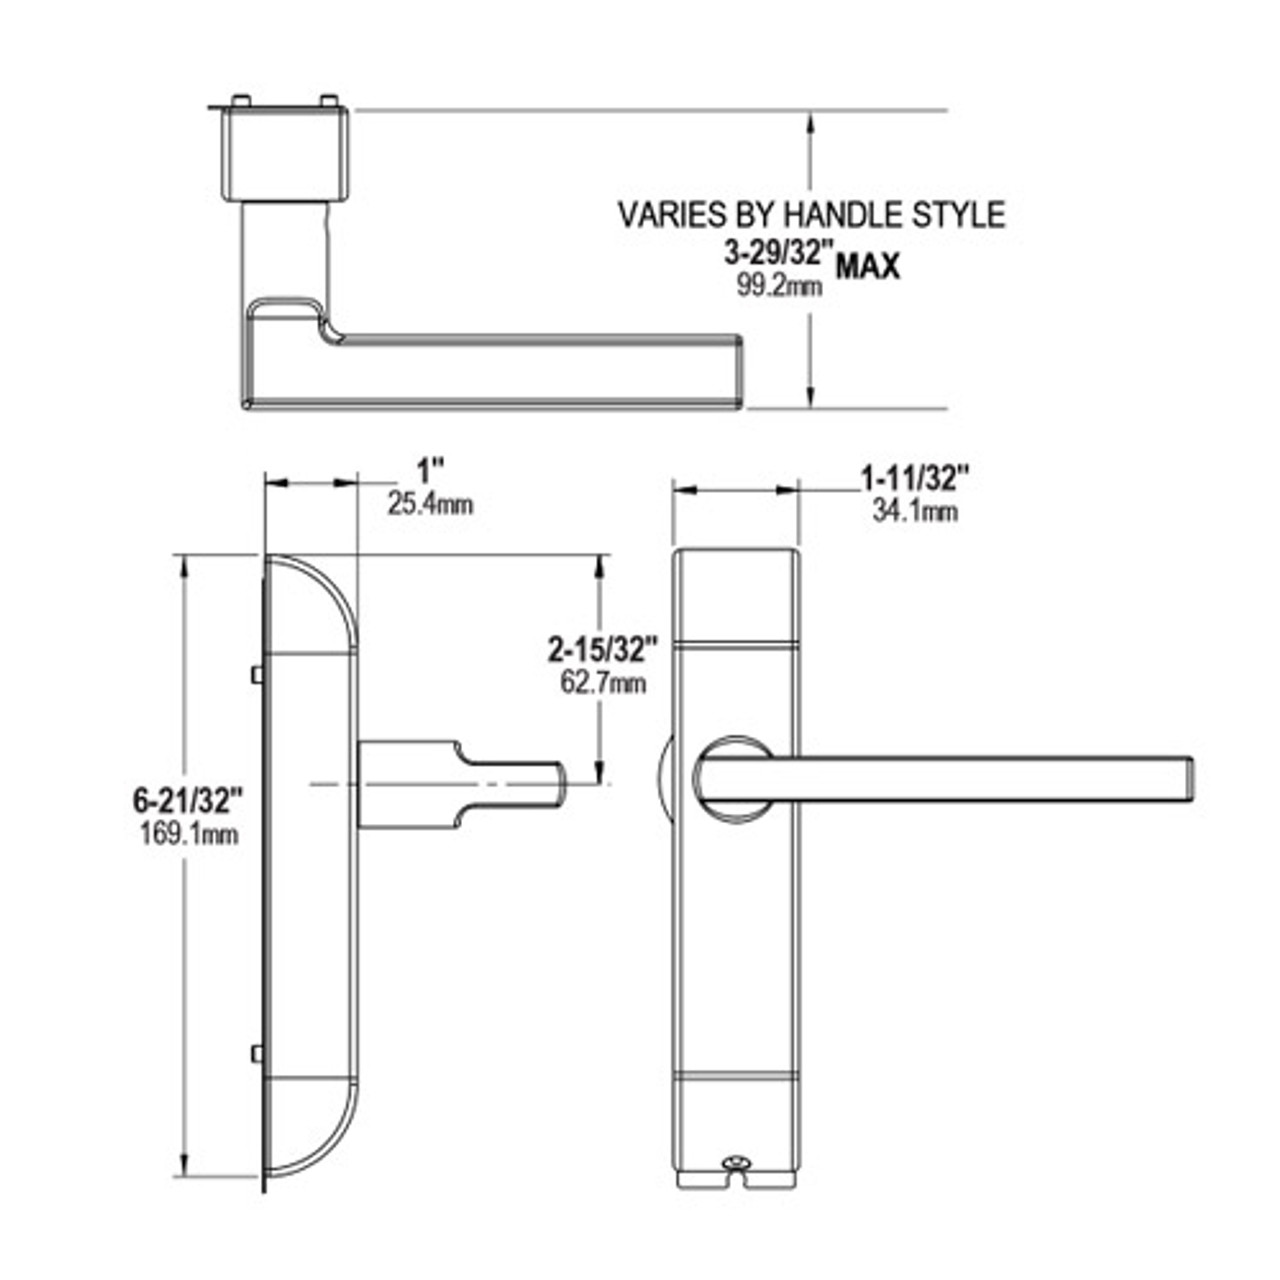 4600-MV-641-US3 Adams Rite MV Designer handle Dimensional View